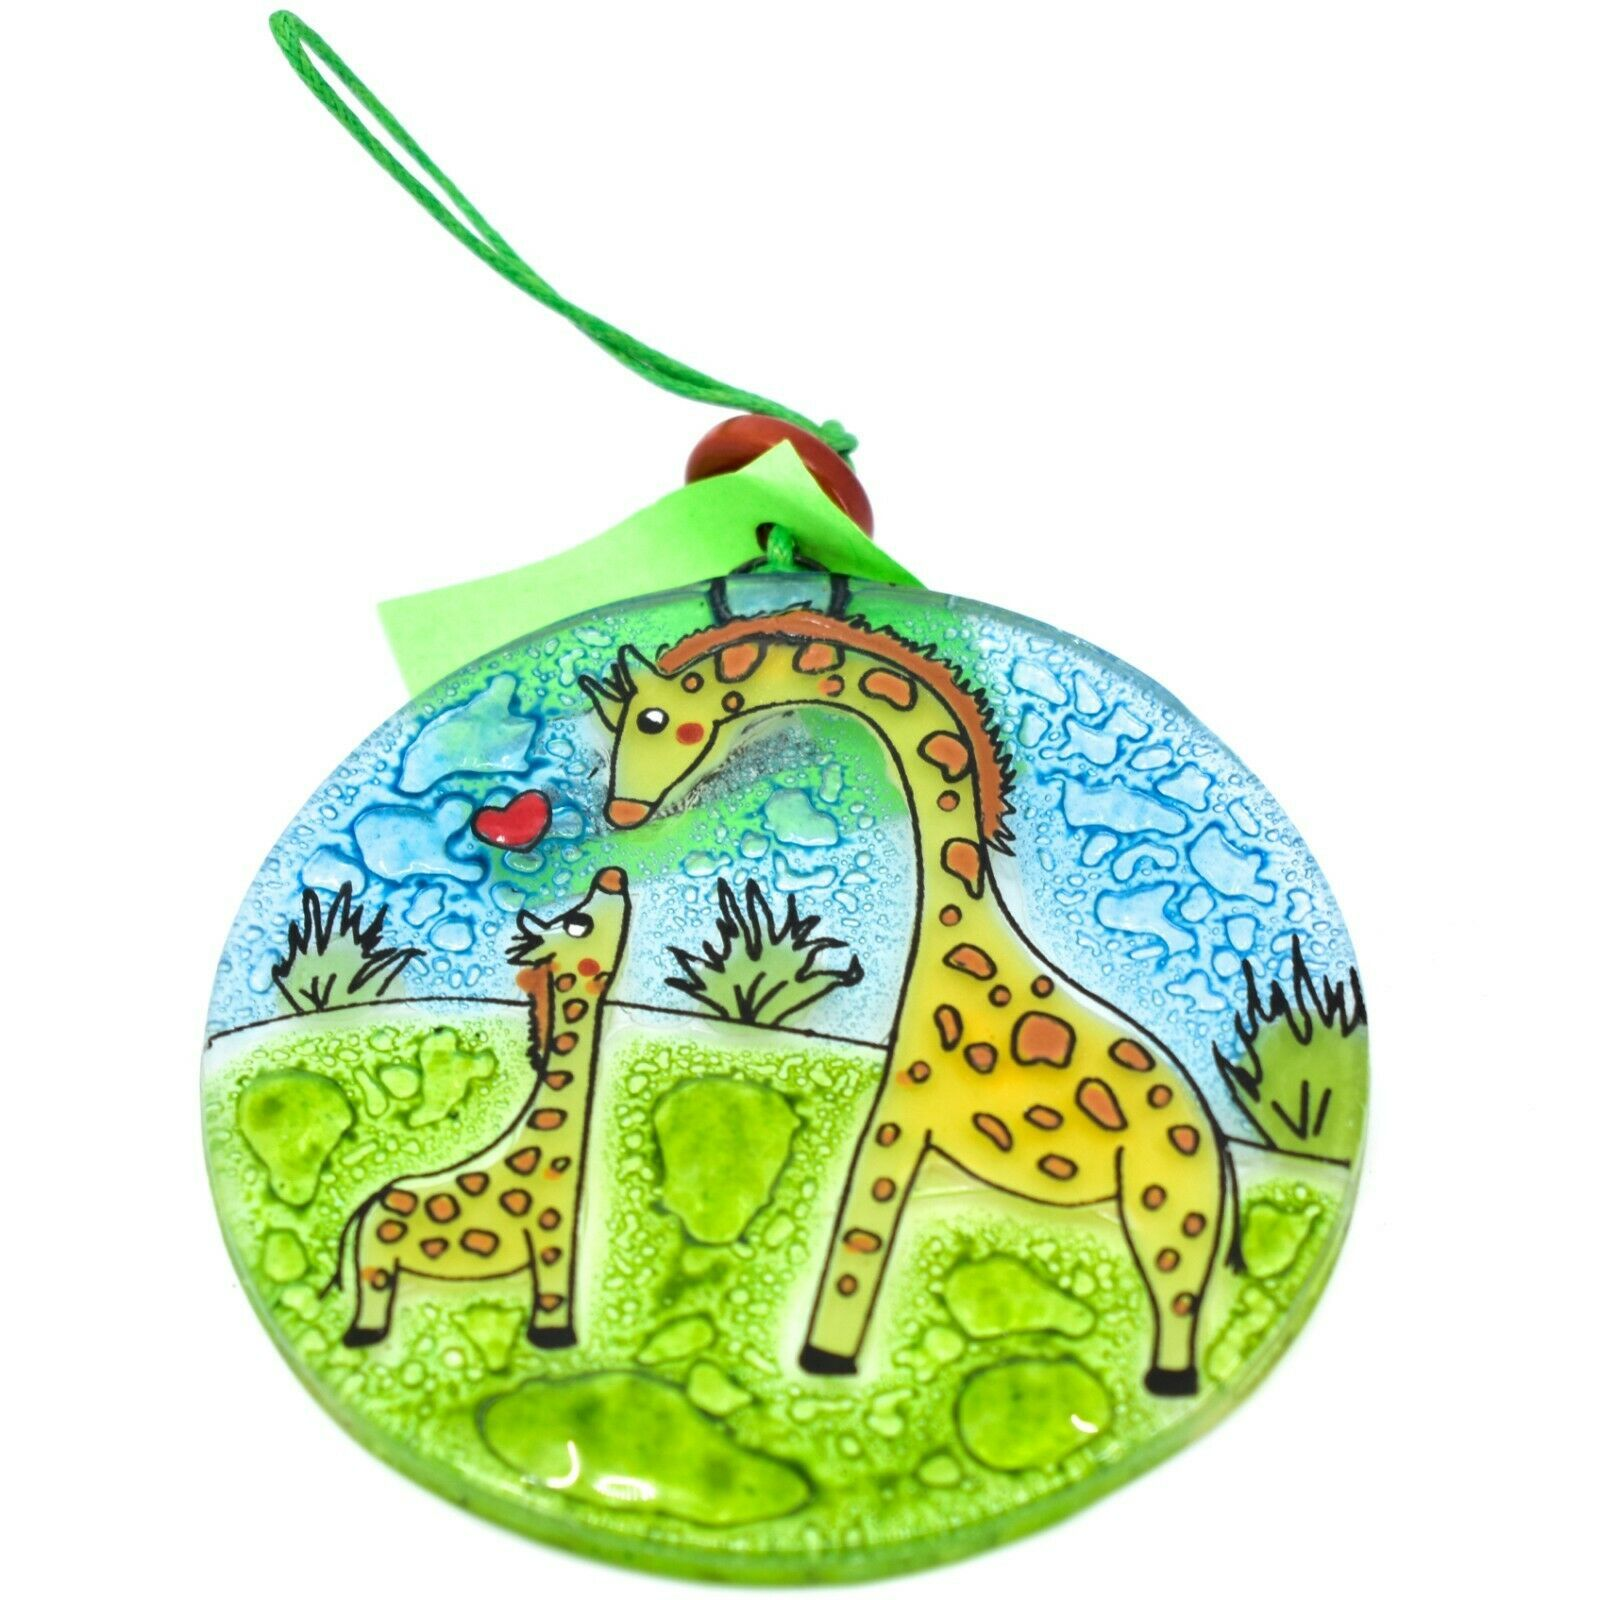 Fused Art Glass Giraffe Mom & Baby Family Ornament Handmade in Ecuador